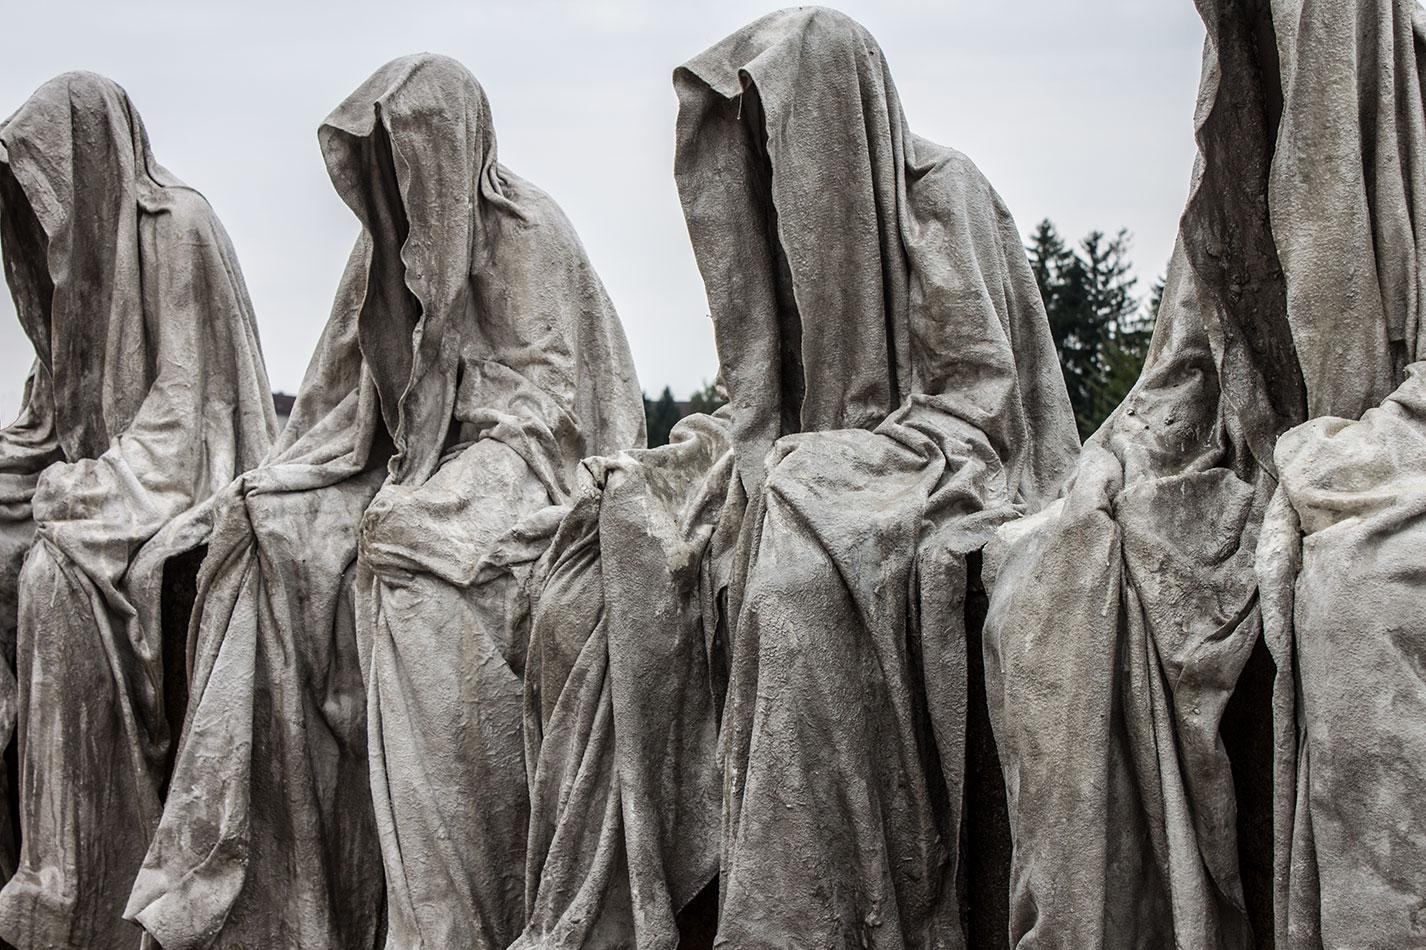 mobile-gallery-guardians-of-time-sculptor-manfred-kili-kielnhofer-contemporary-fine-art-design-sculpture-modern-famous-3d-statue-public-arts-2586